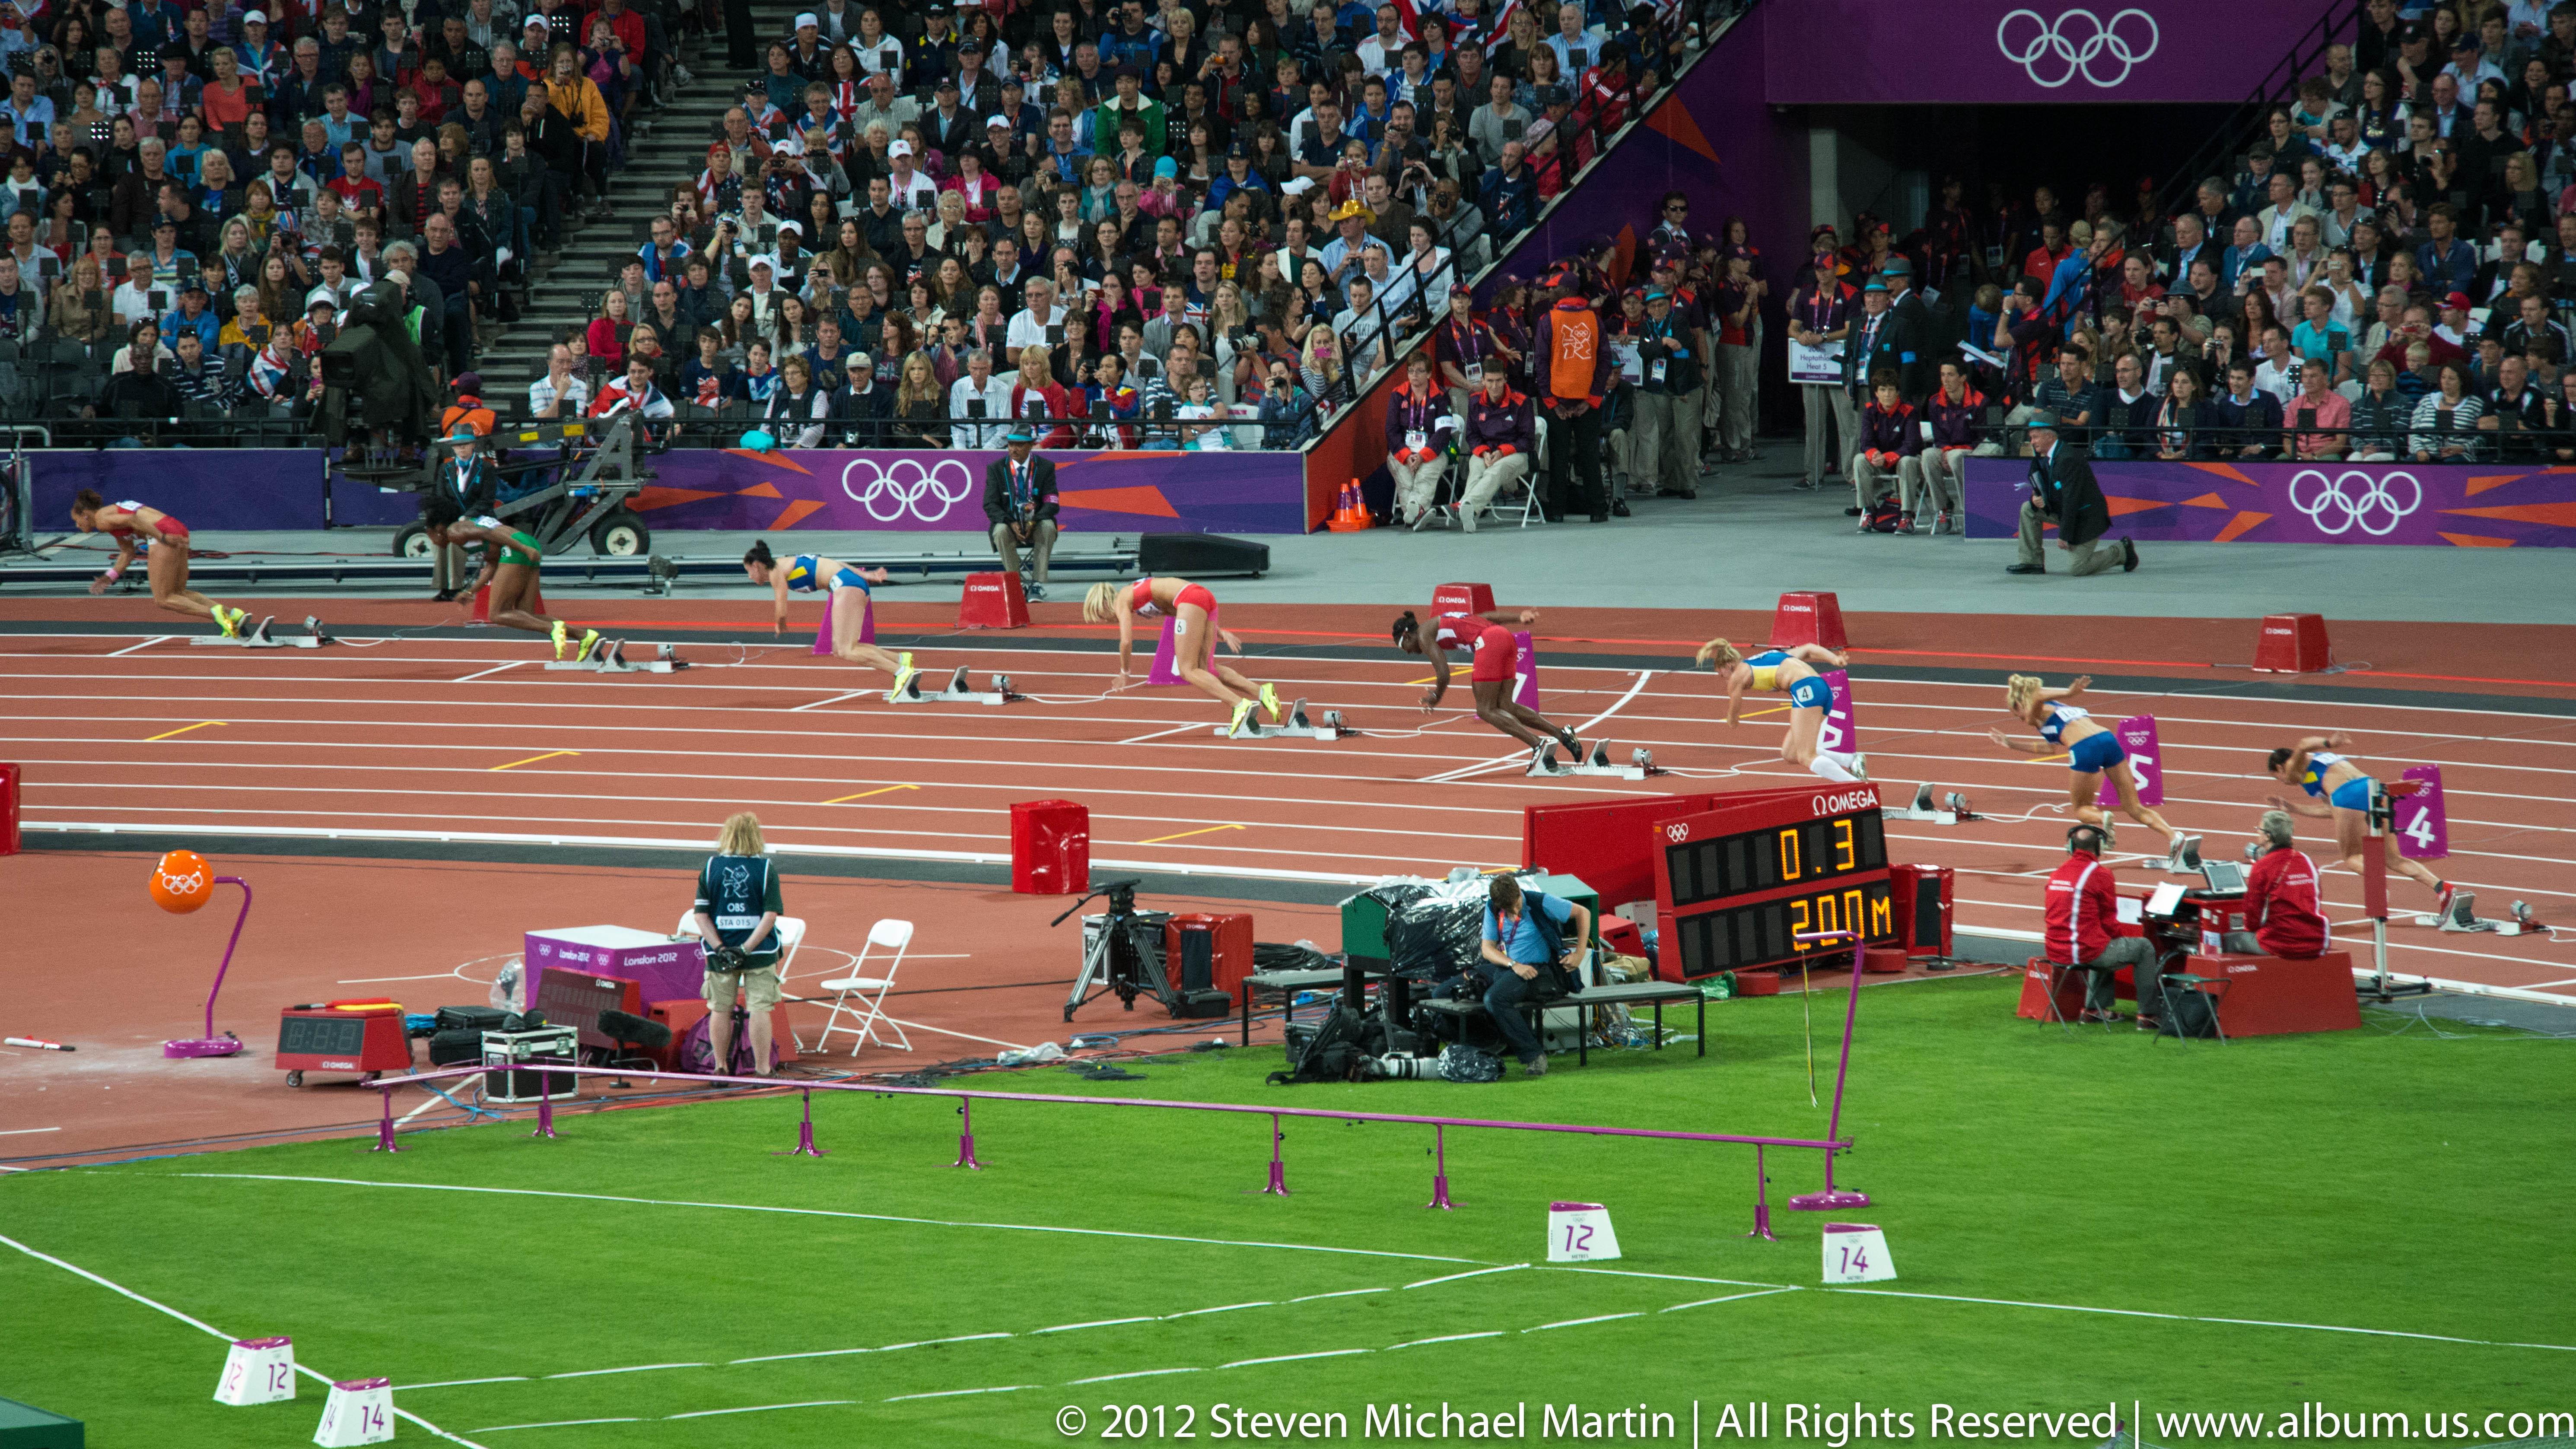 SMartin_2012 Olympics Athletics_20120803_032